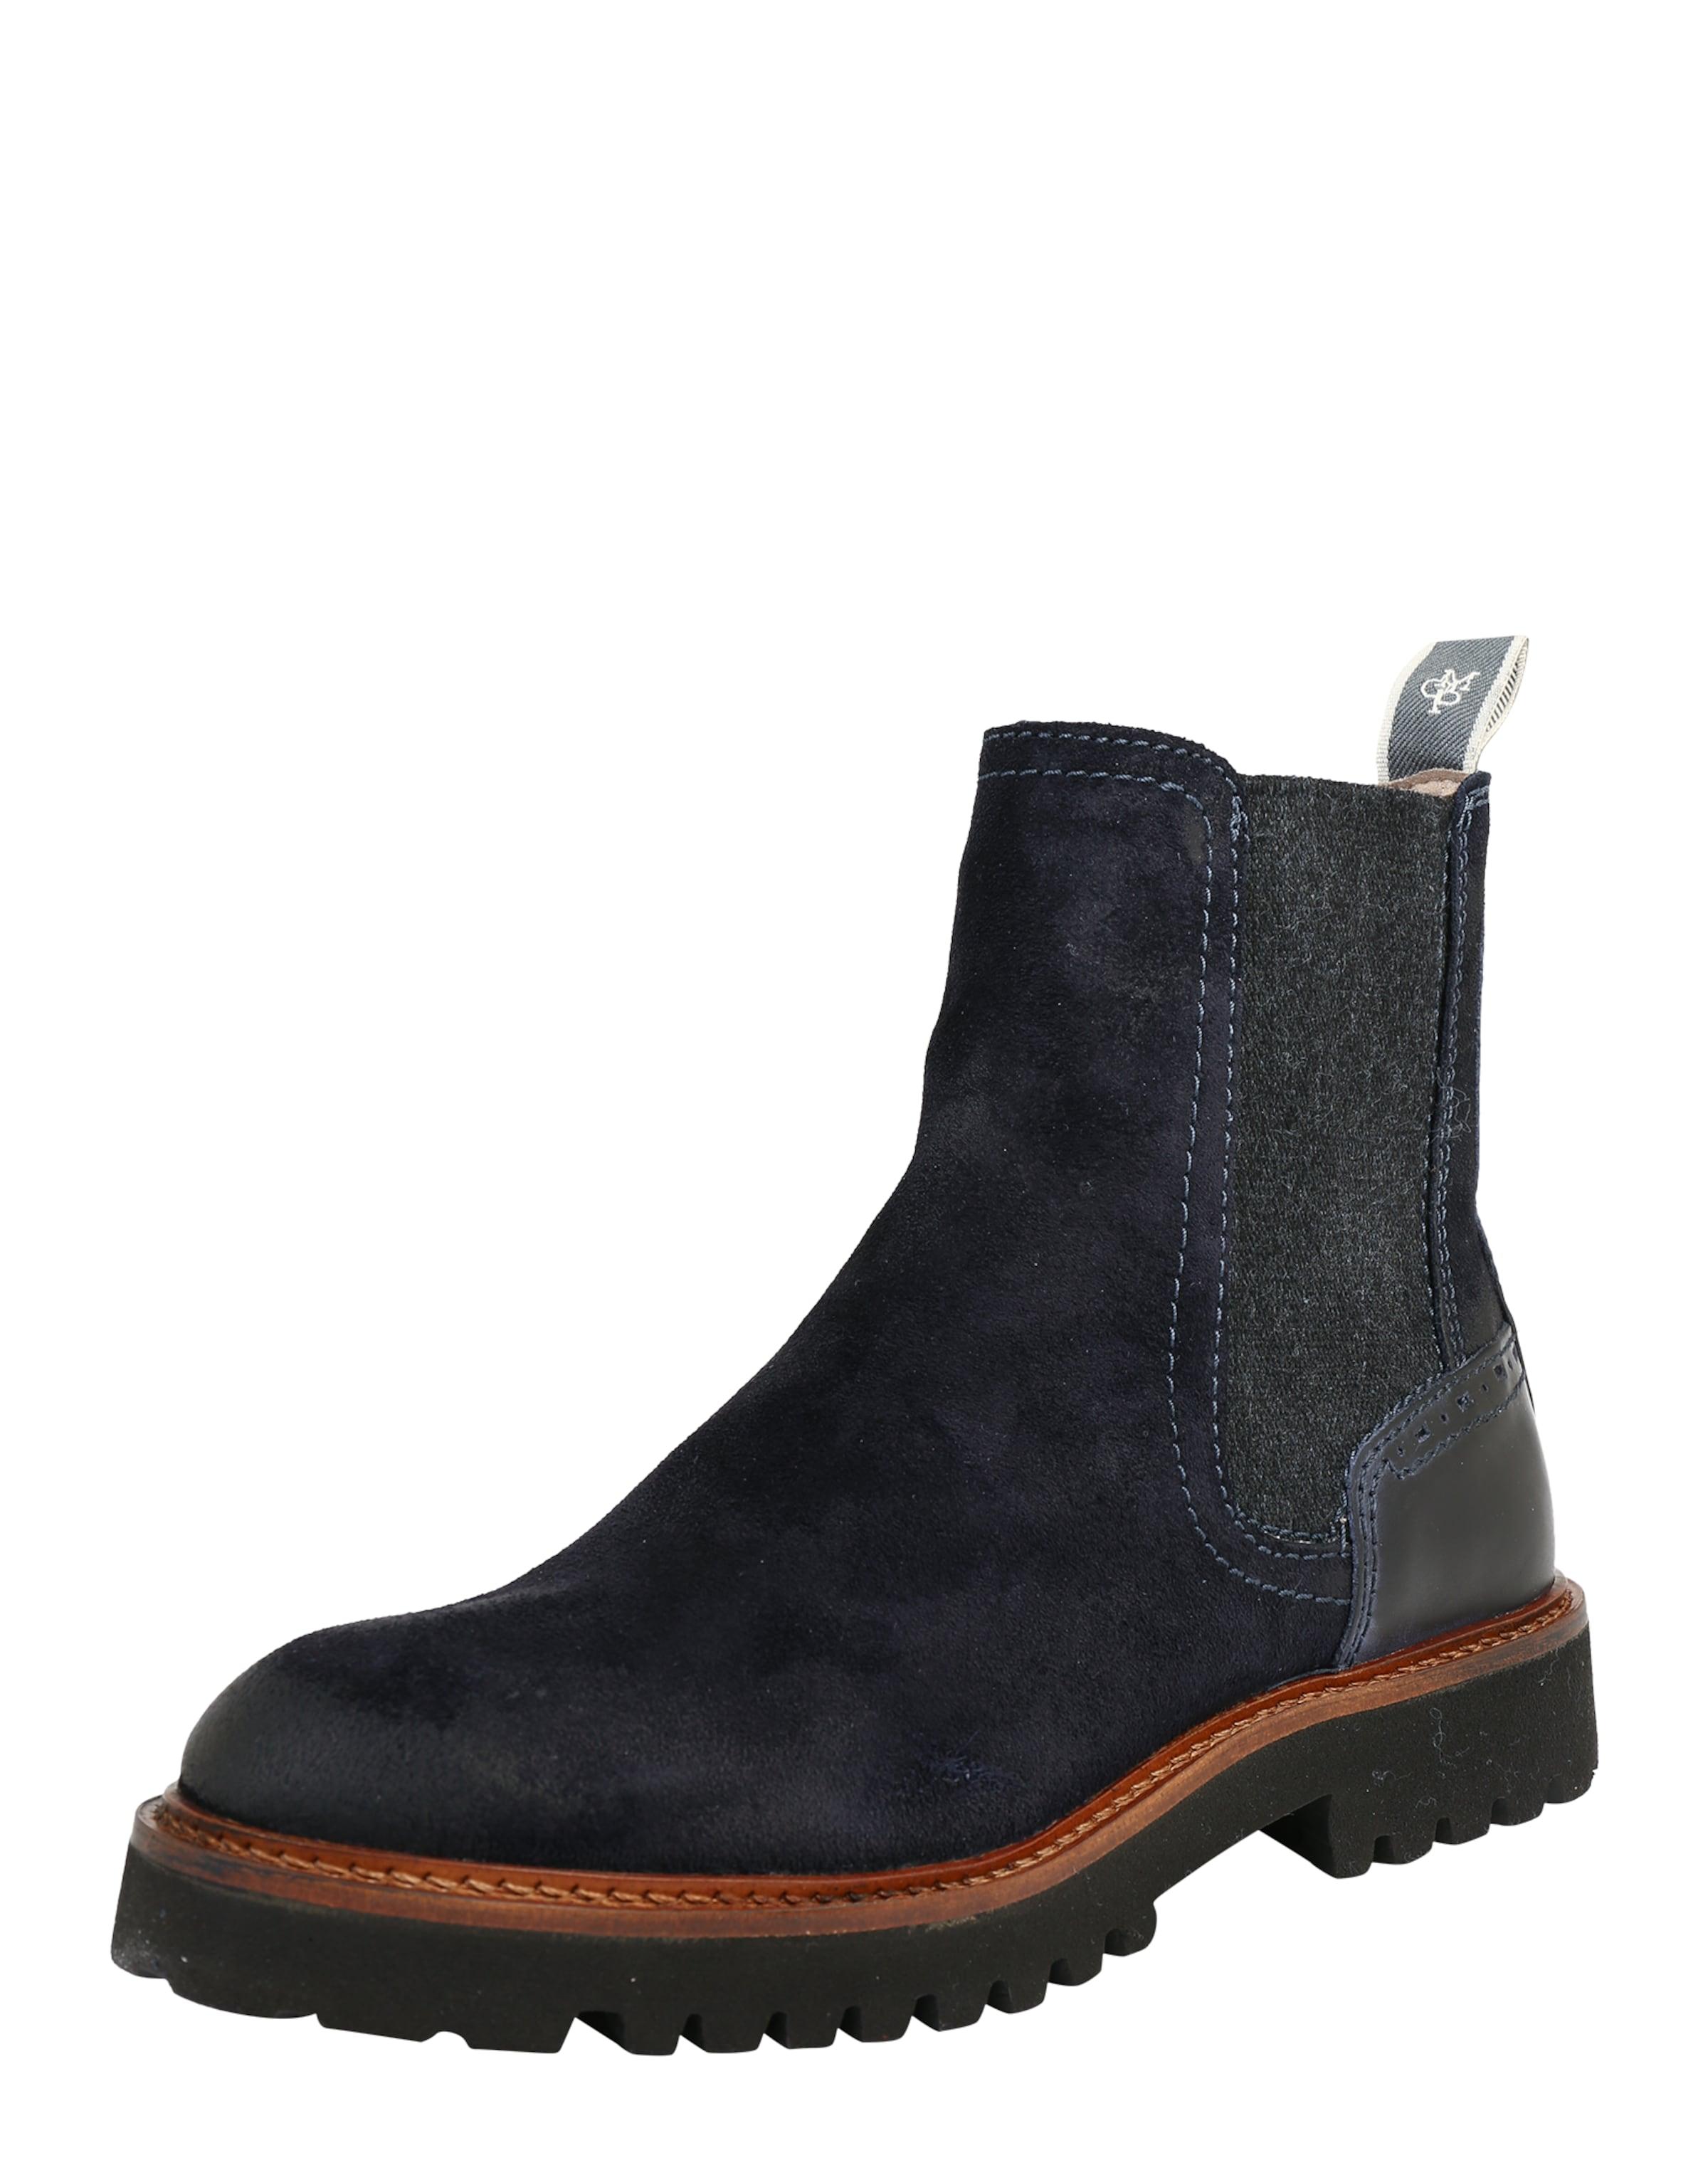 Marc O'Polo Chelsea Boots 'Flat' Wo Niedrigen Preis Kaufen Günstiger Preis Niedrig Versandgebühr 32wigiB